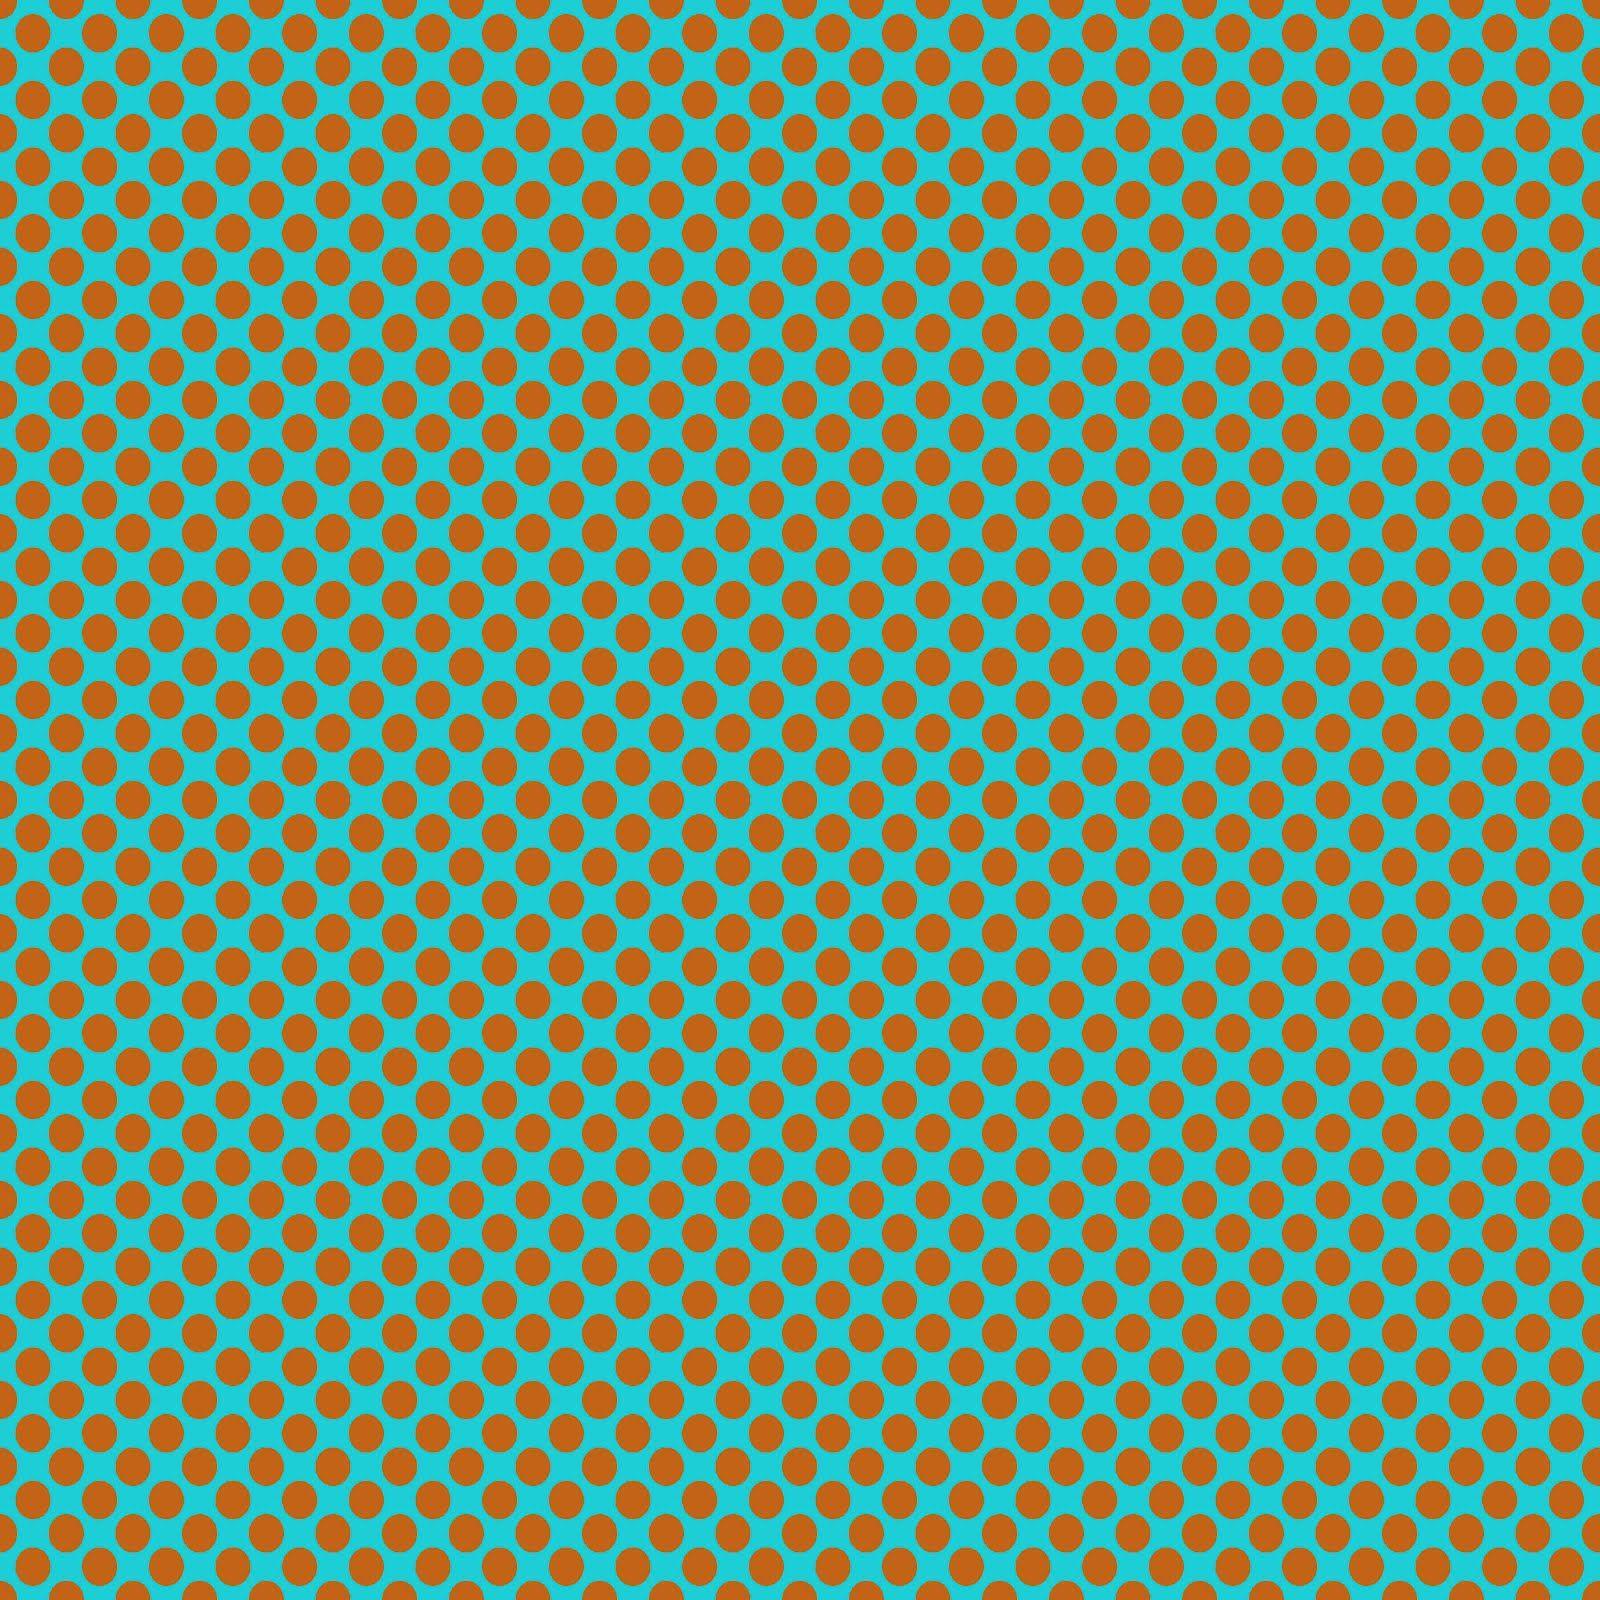 Pin By Hasibe Atlas On Dekupaj Fon Free Digital Scrapbooking Digital Scrapbook Paper Scrapbook Paper